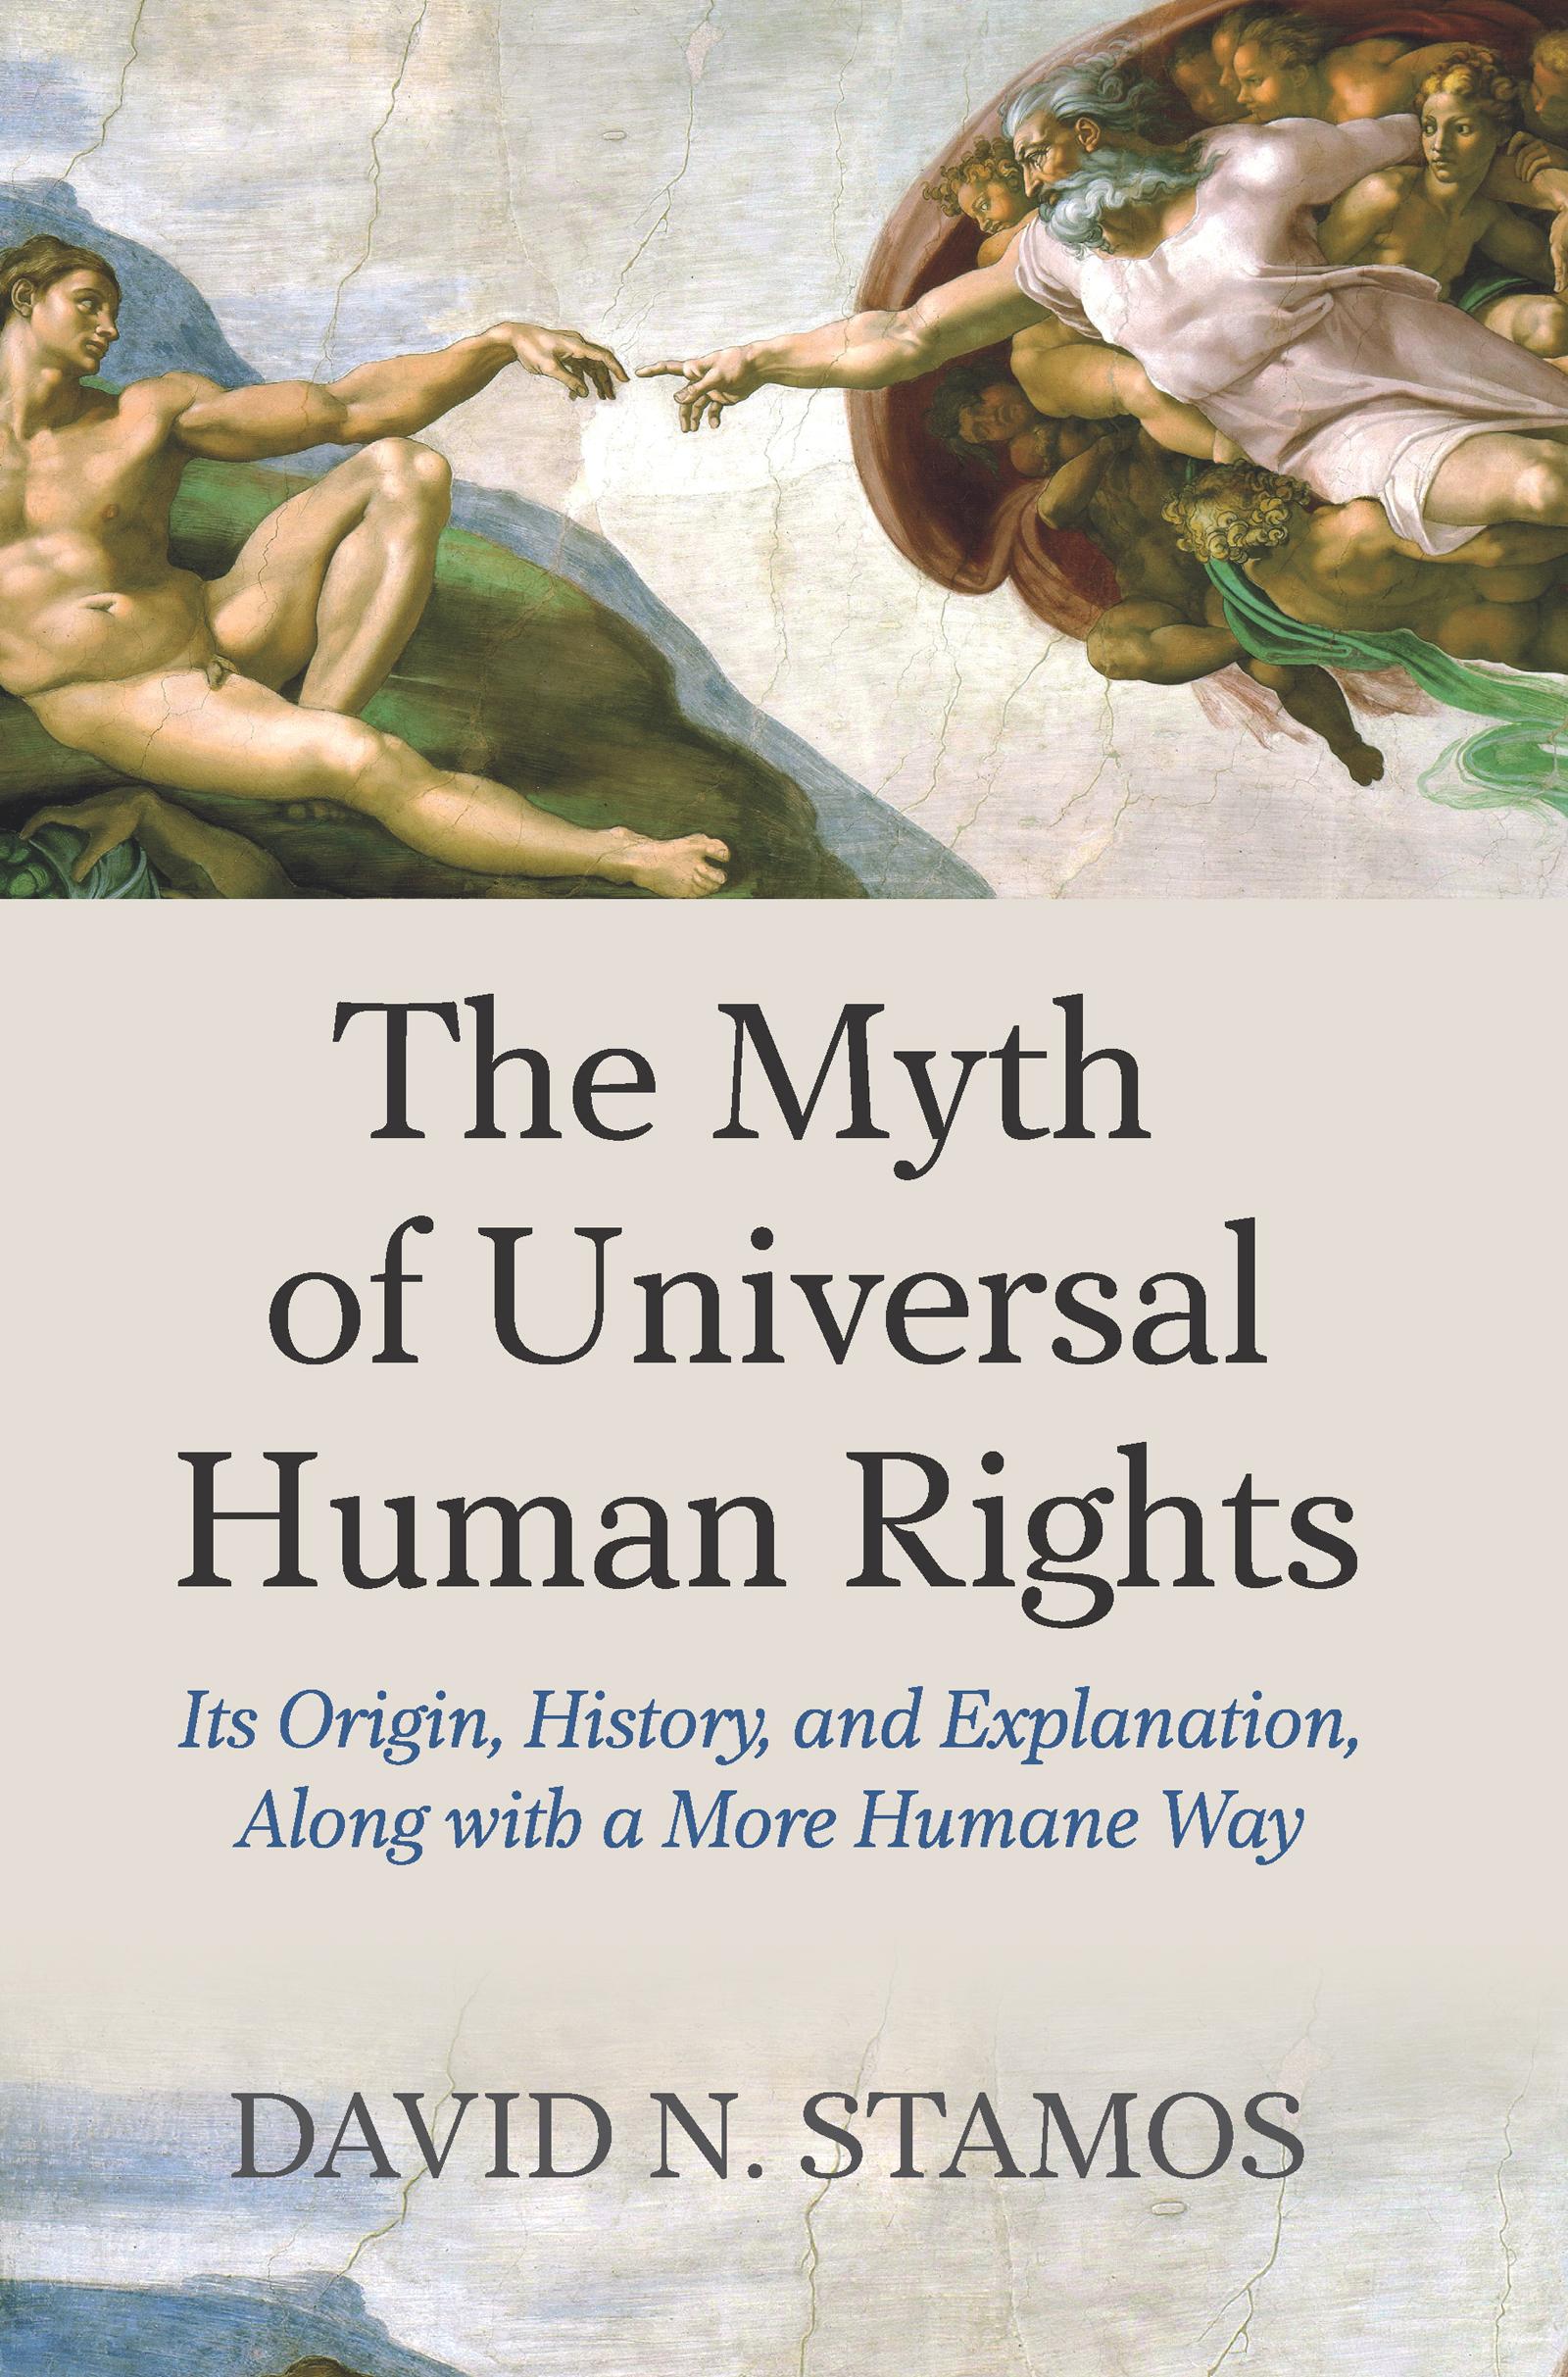 Myth of Universal Human Rights